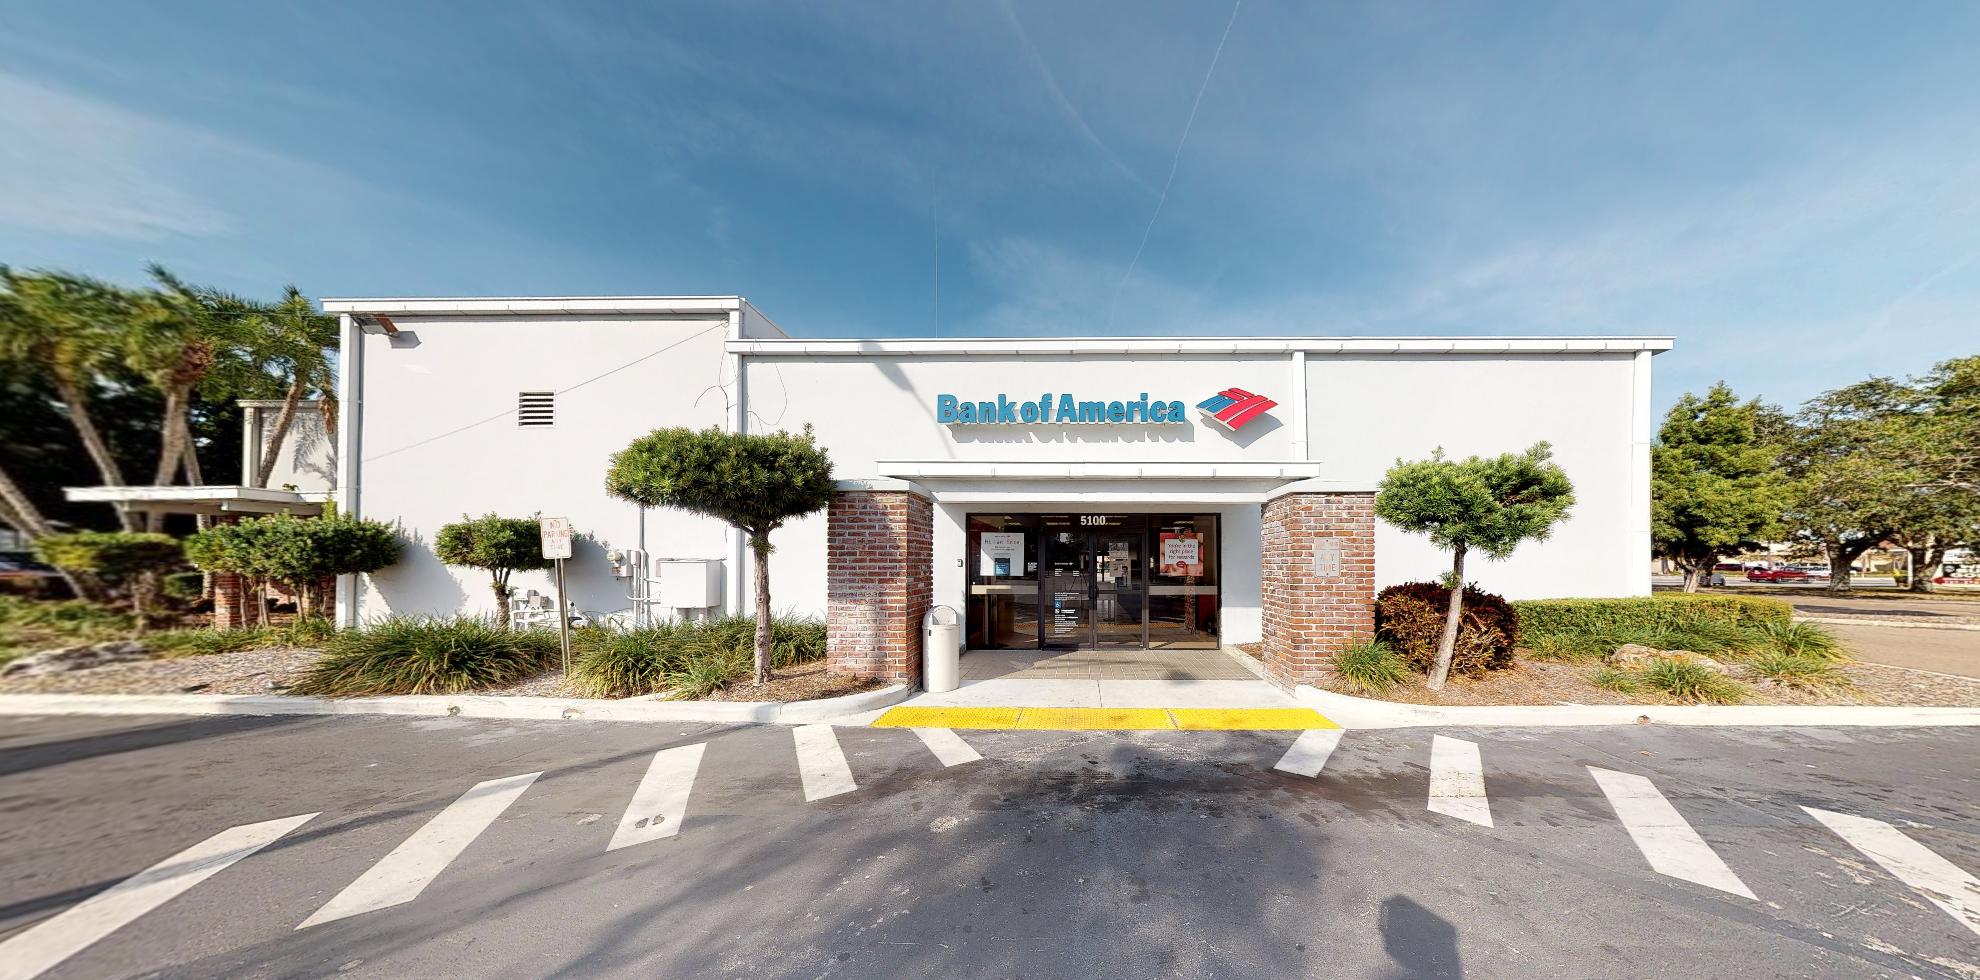 Bank of America financial center with drive-thru ATM | 5100 Park Blvd, Pinellas Park, FL 33781